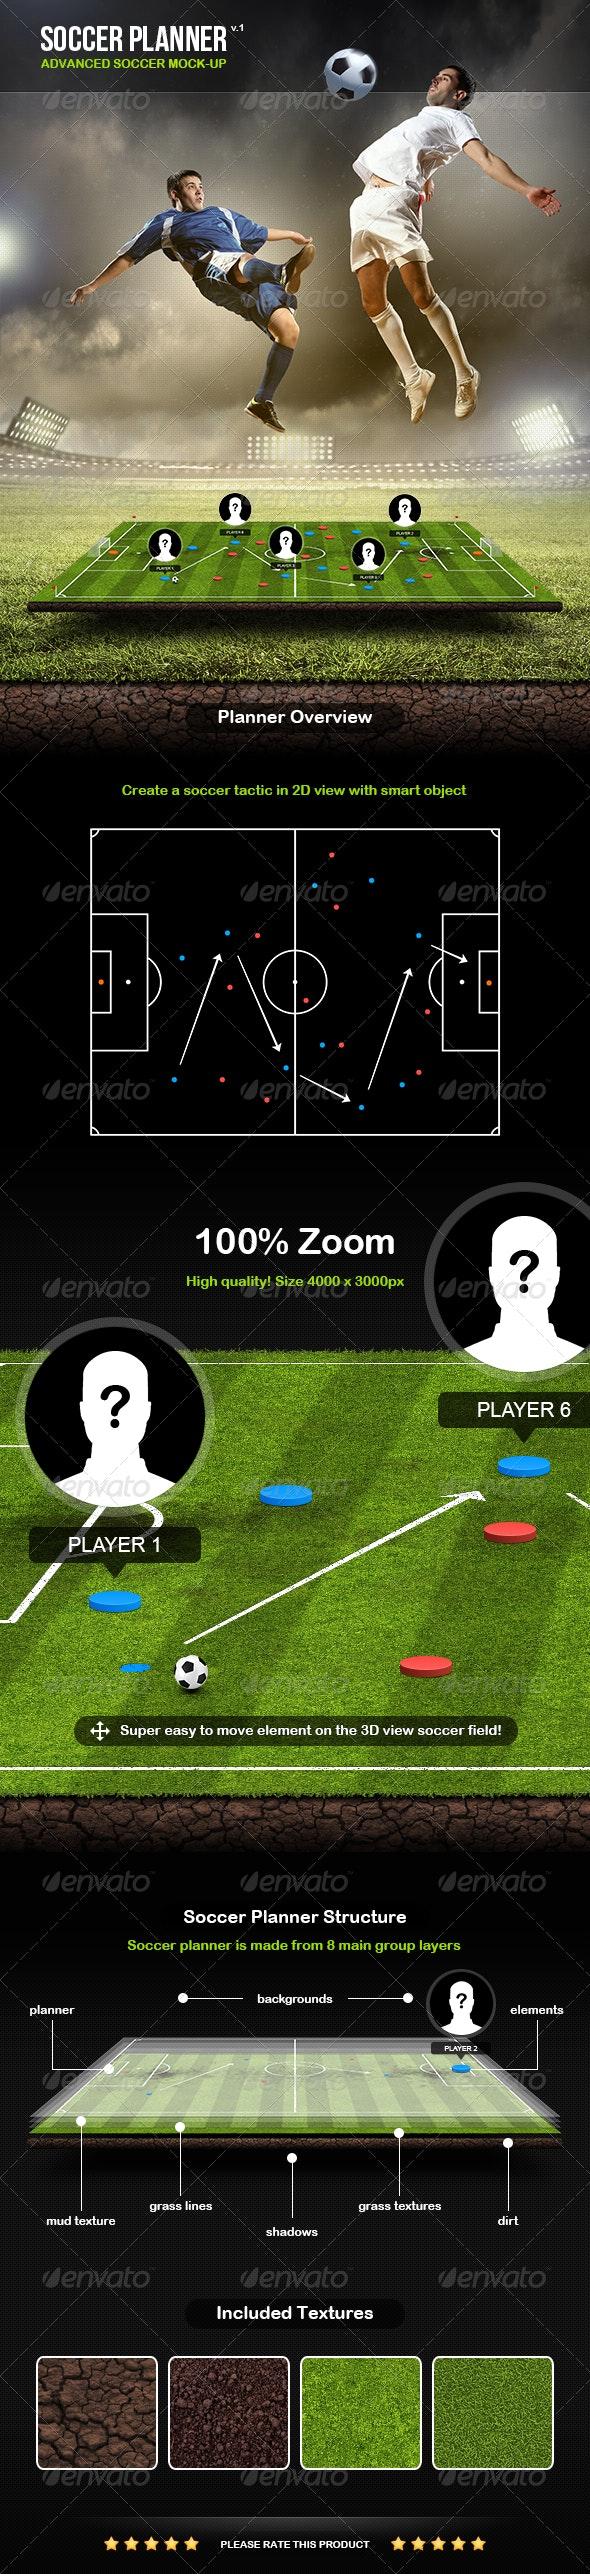 Soccer Planner - Scenes Illustrations